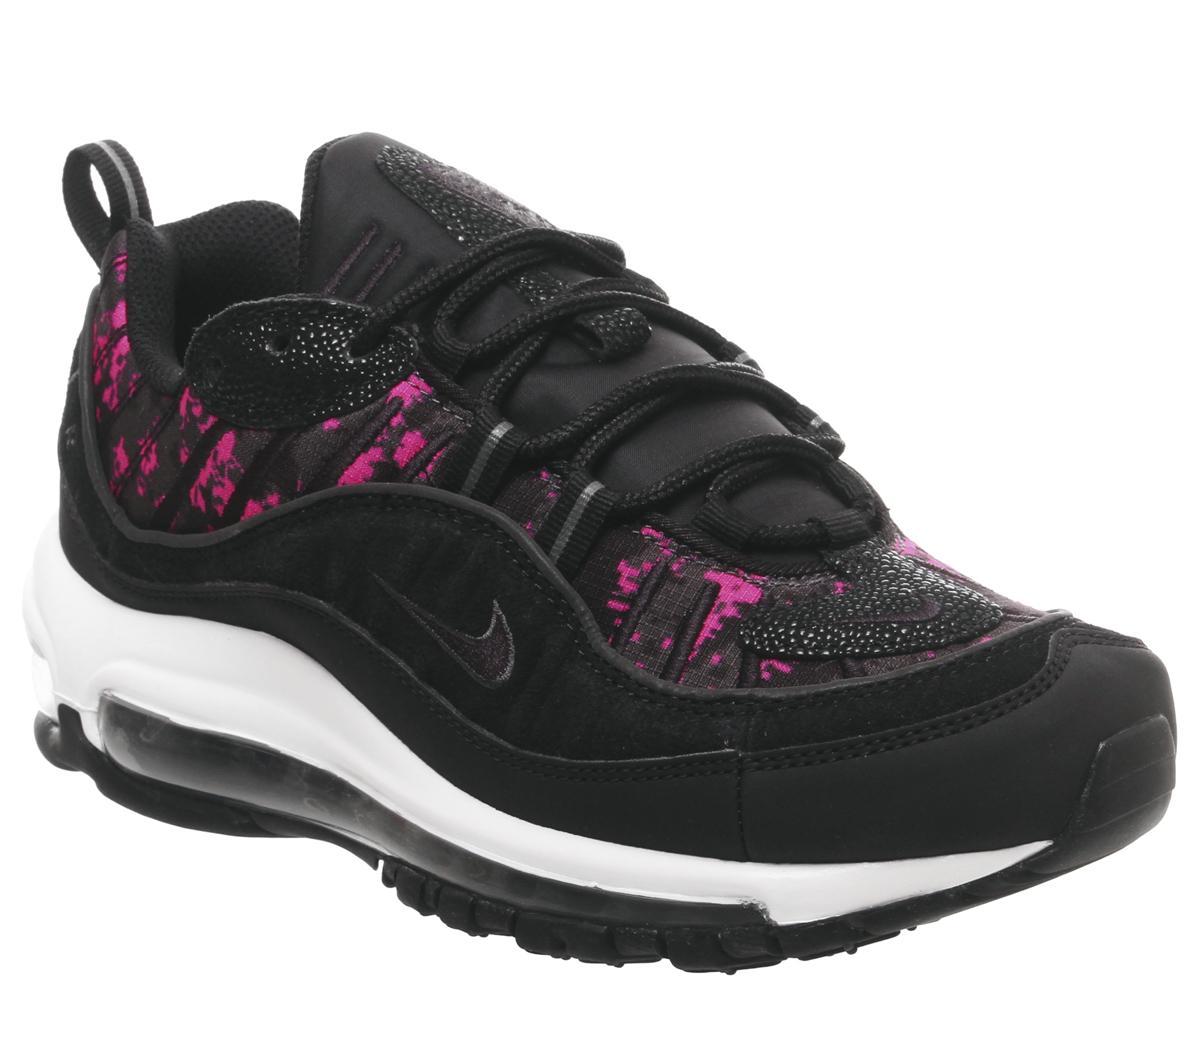 Nike Air Max 98 Trainers Black Black